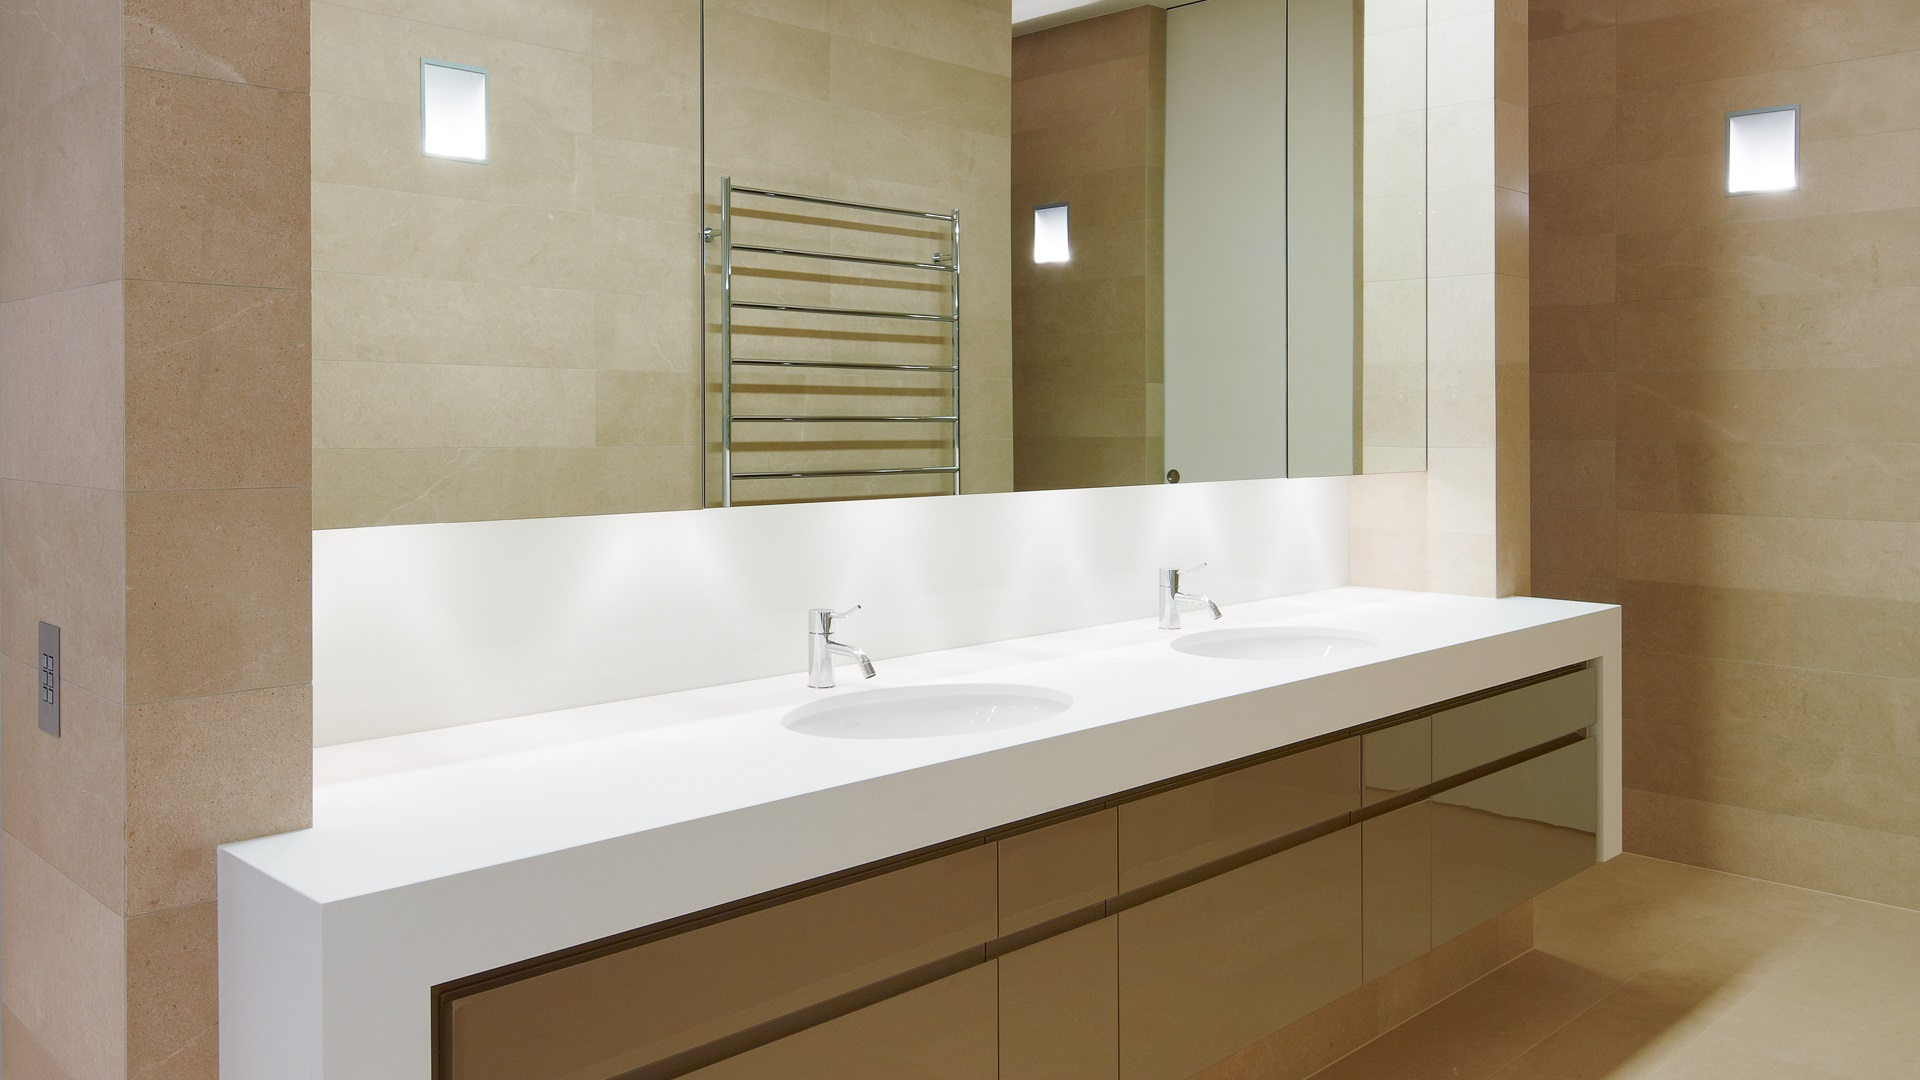 Image Result For Bathroom Vanity Top